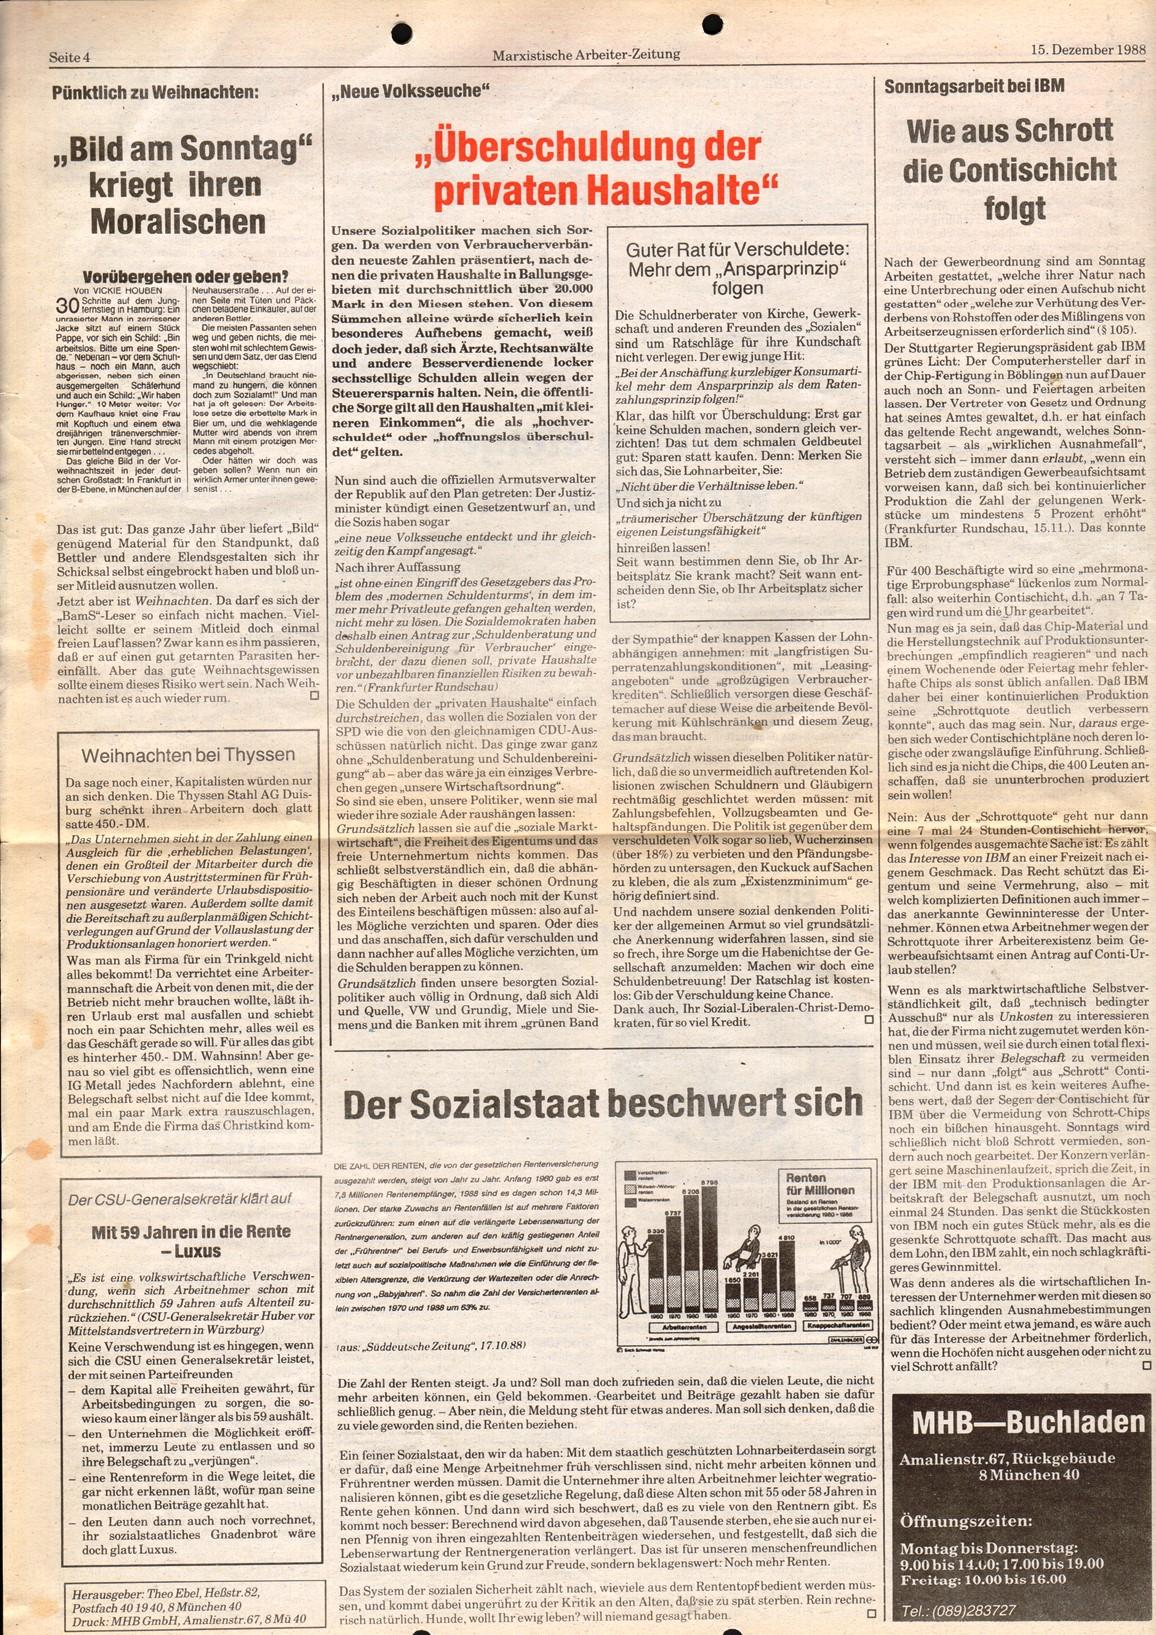 Muenchen_MG_MAZ_19881215_04